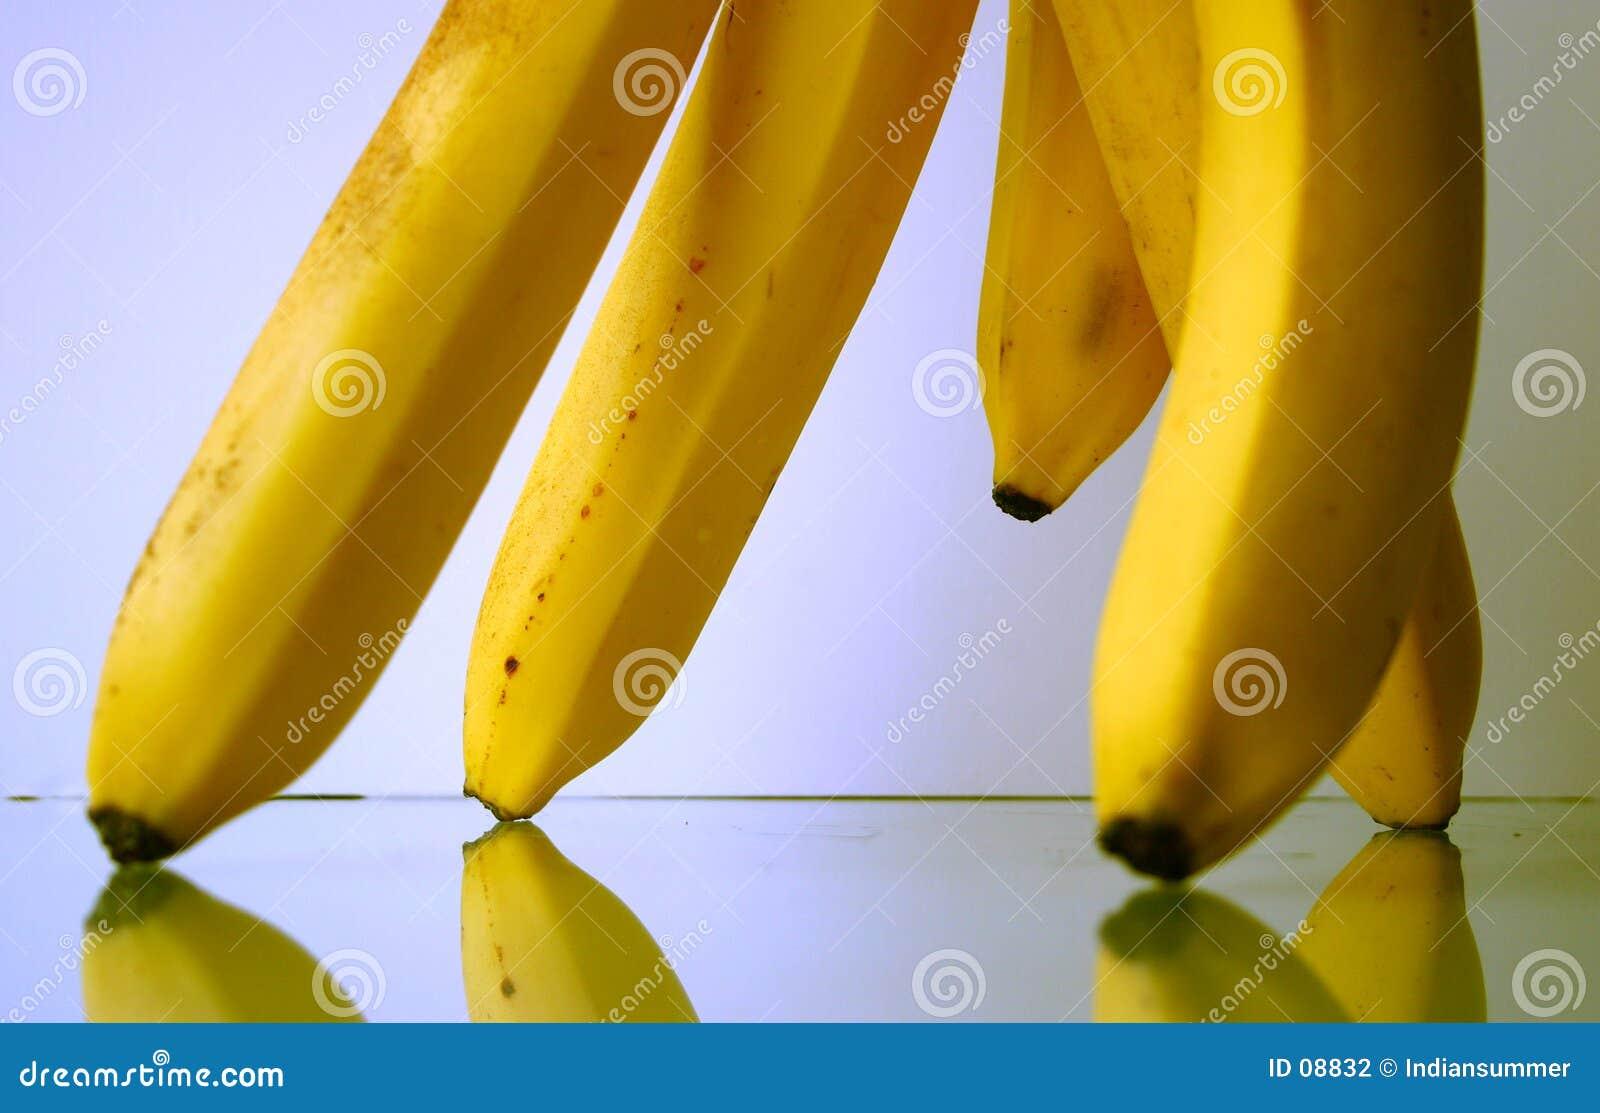 Parata II delle banane